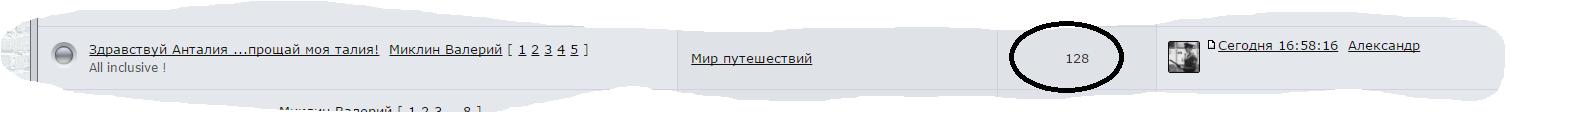 http://s6.uploads.ru/N3fDC.png